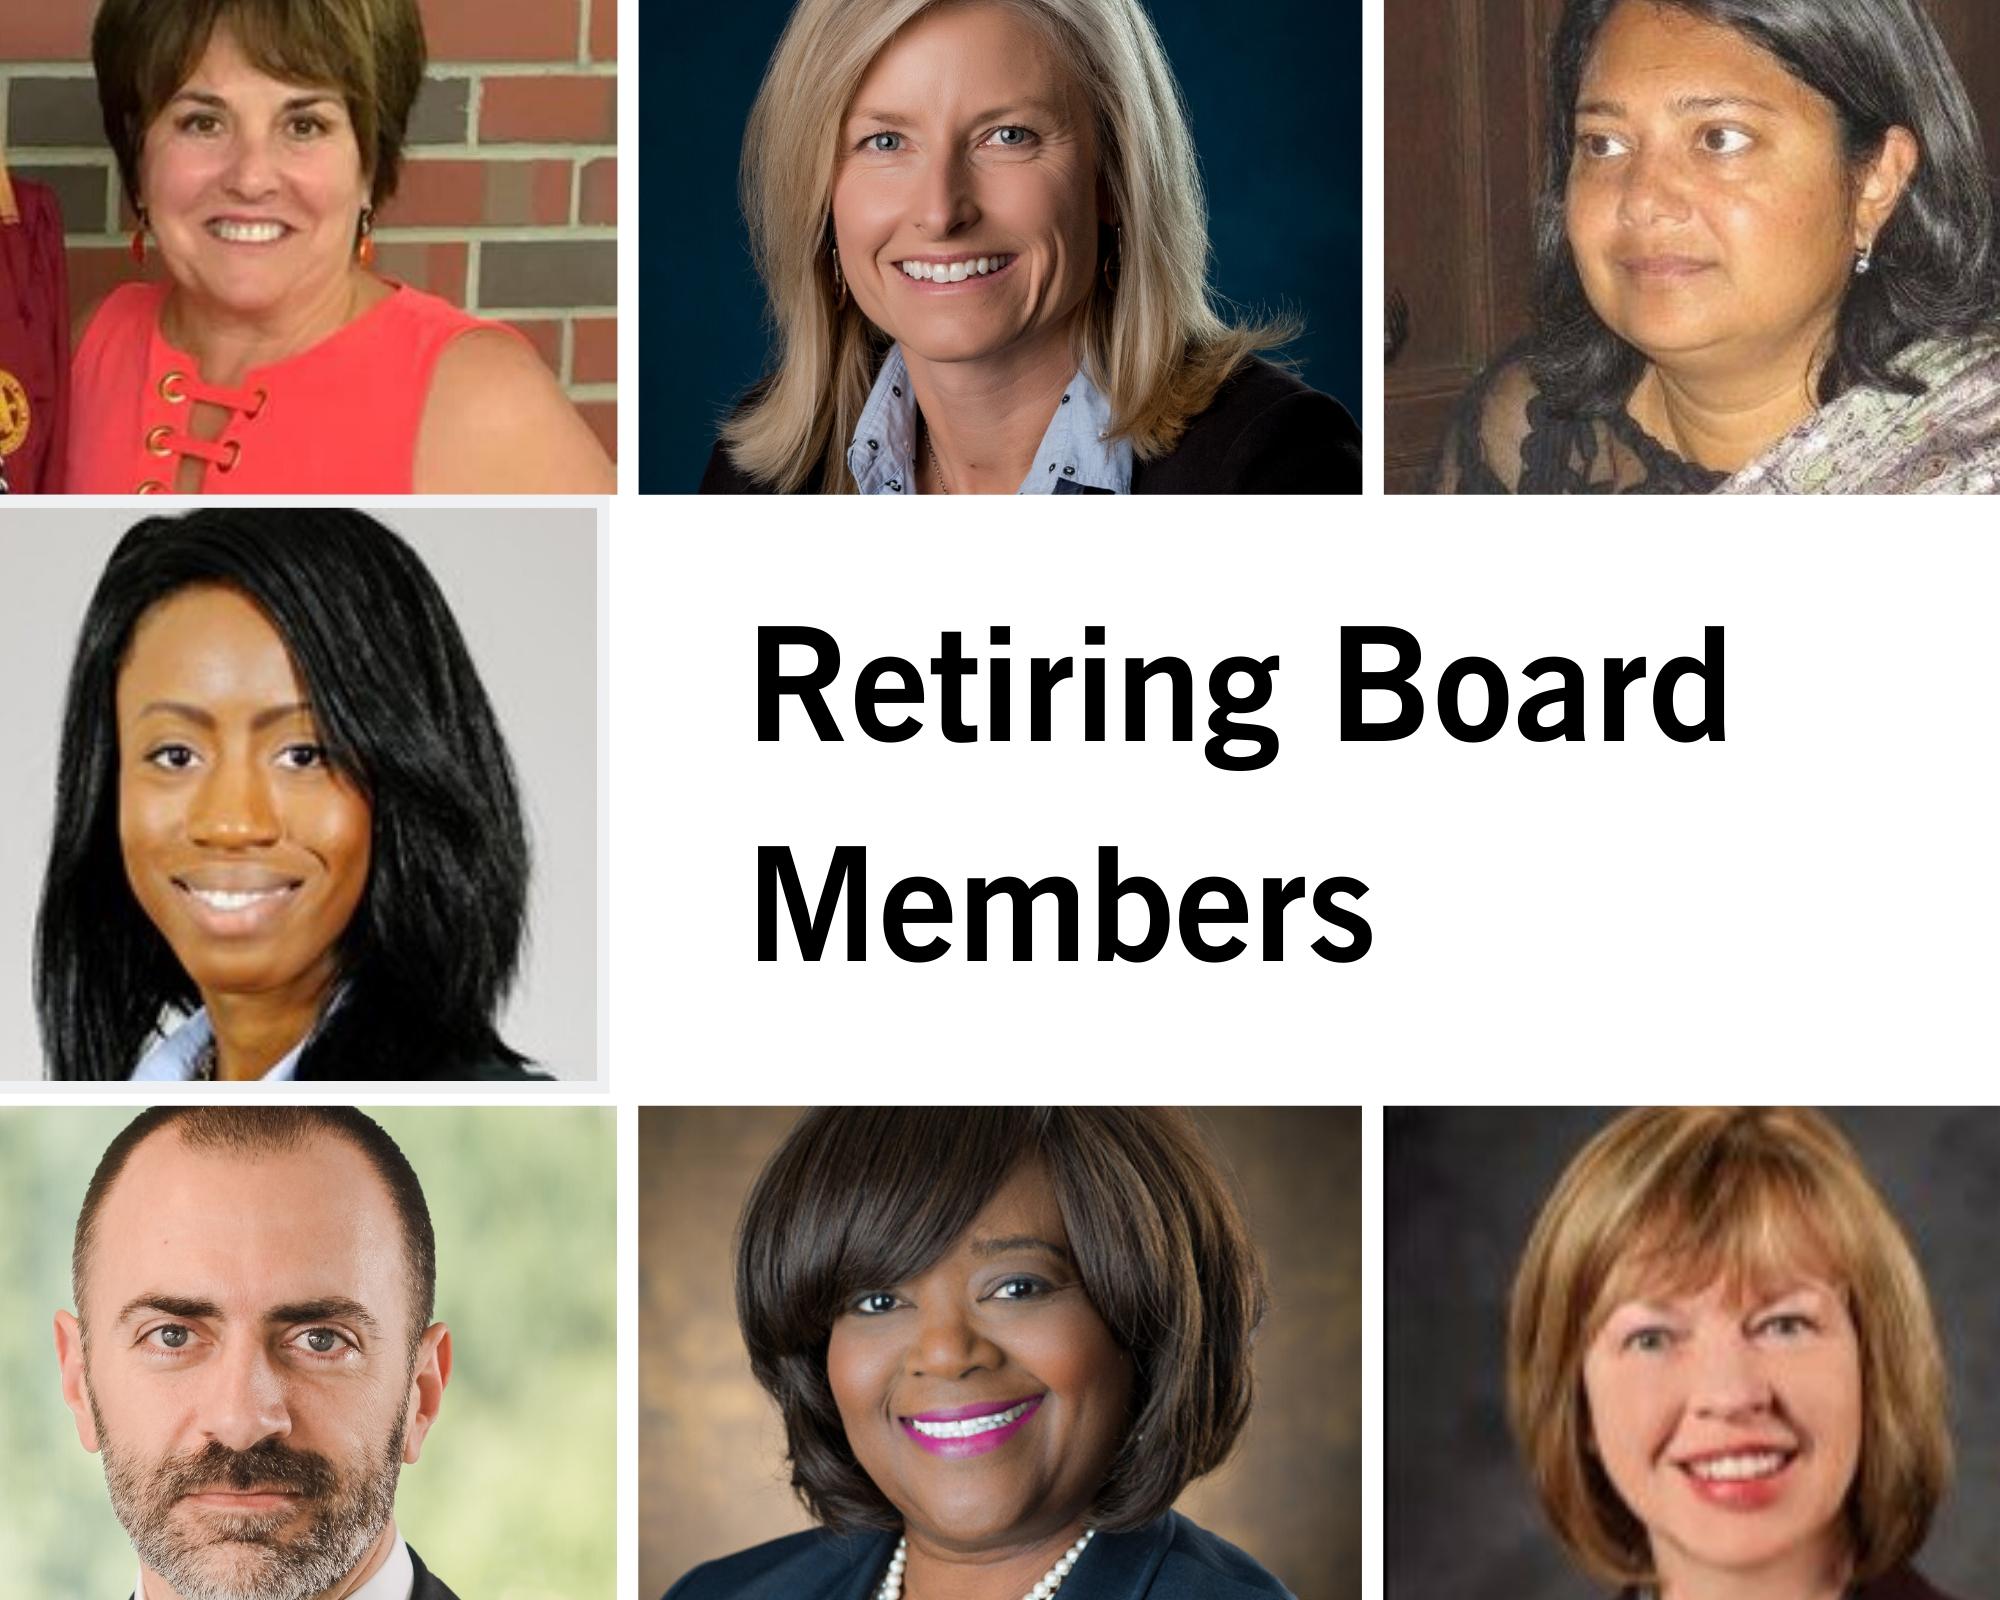 Retiring Board Members